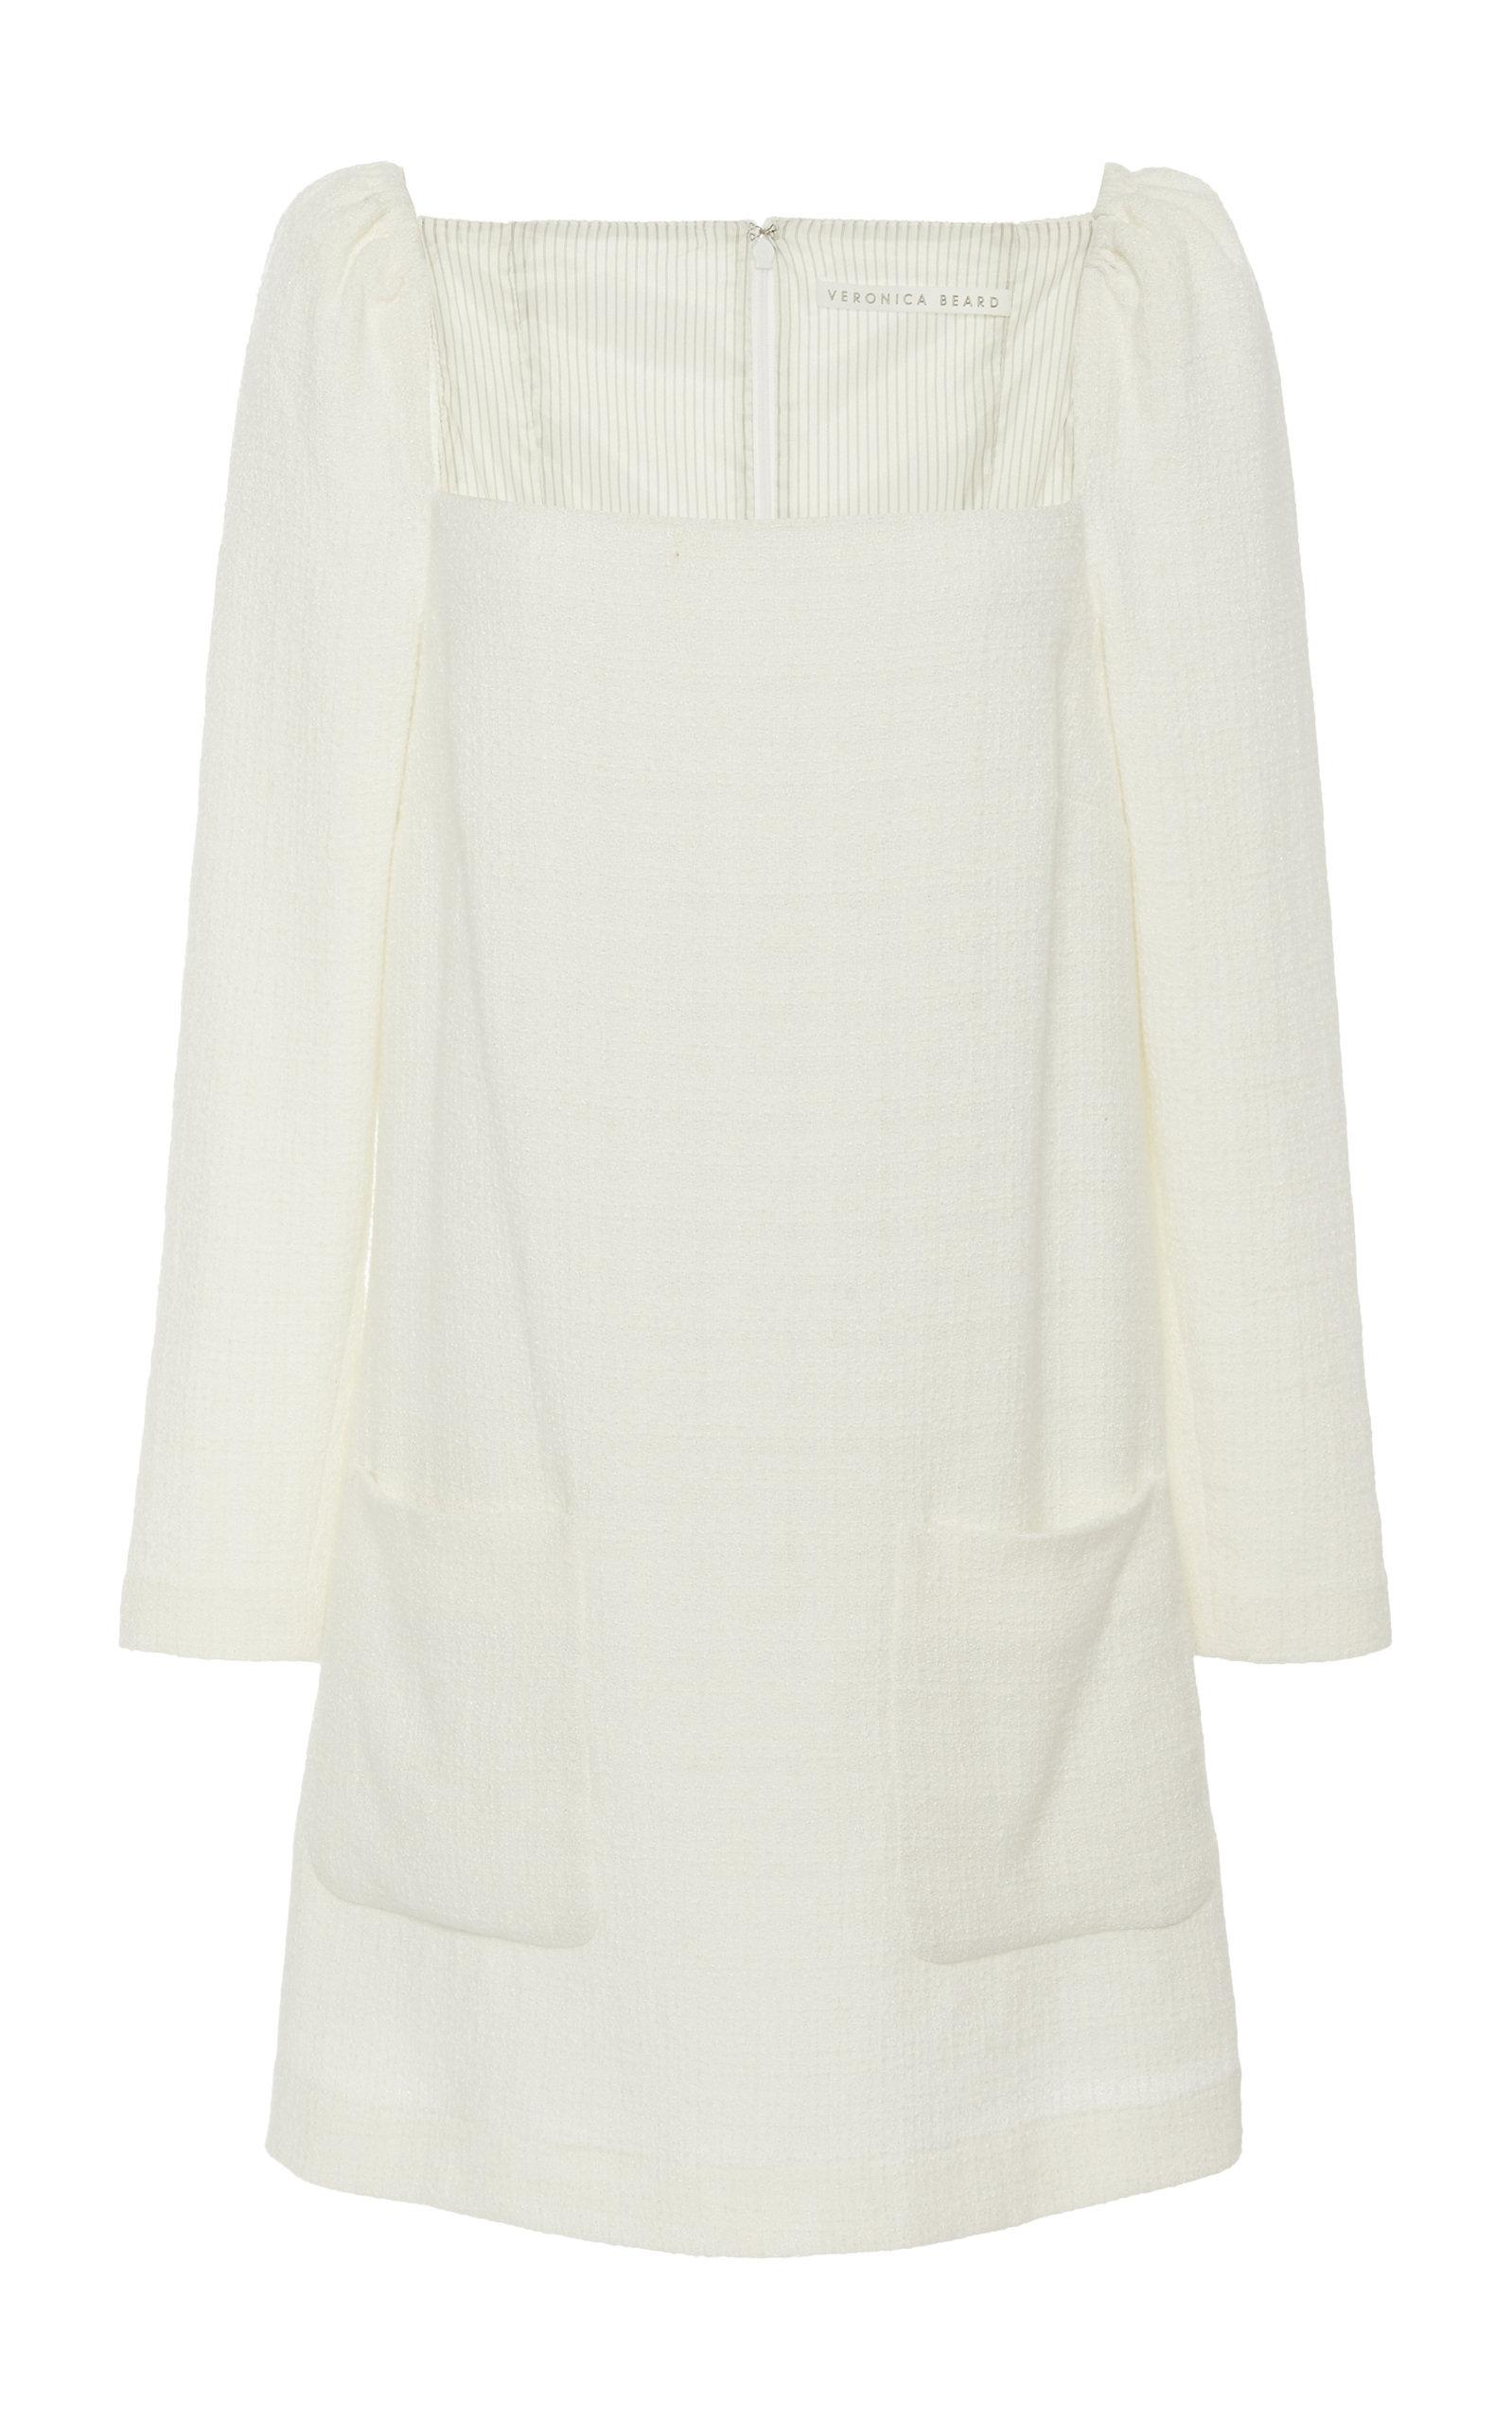 Buy Veronica Beard Alona Structured Mini Dress online, shop Veronica Beard at the best price